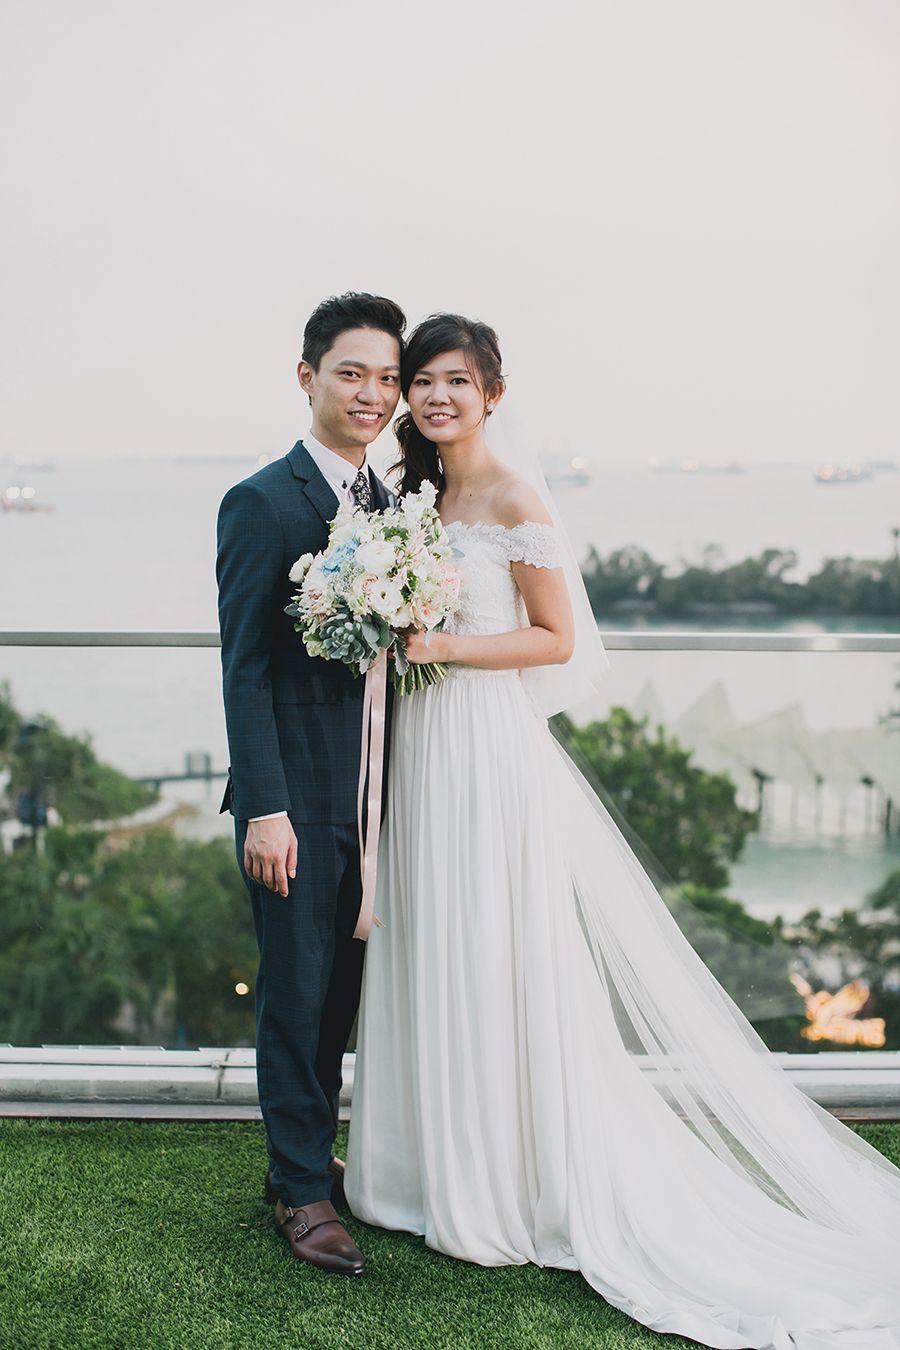 Solemnise wedding dresses